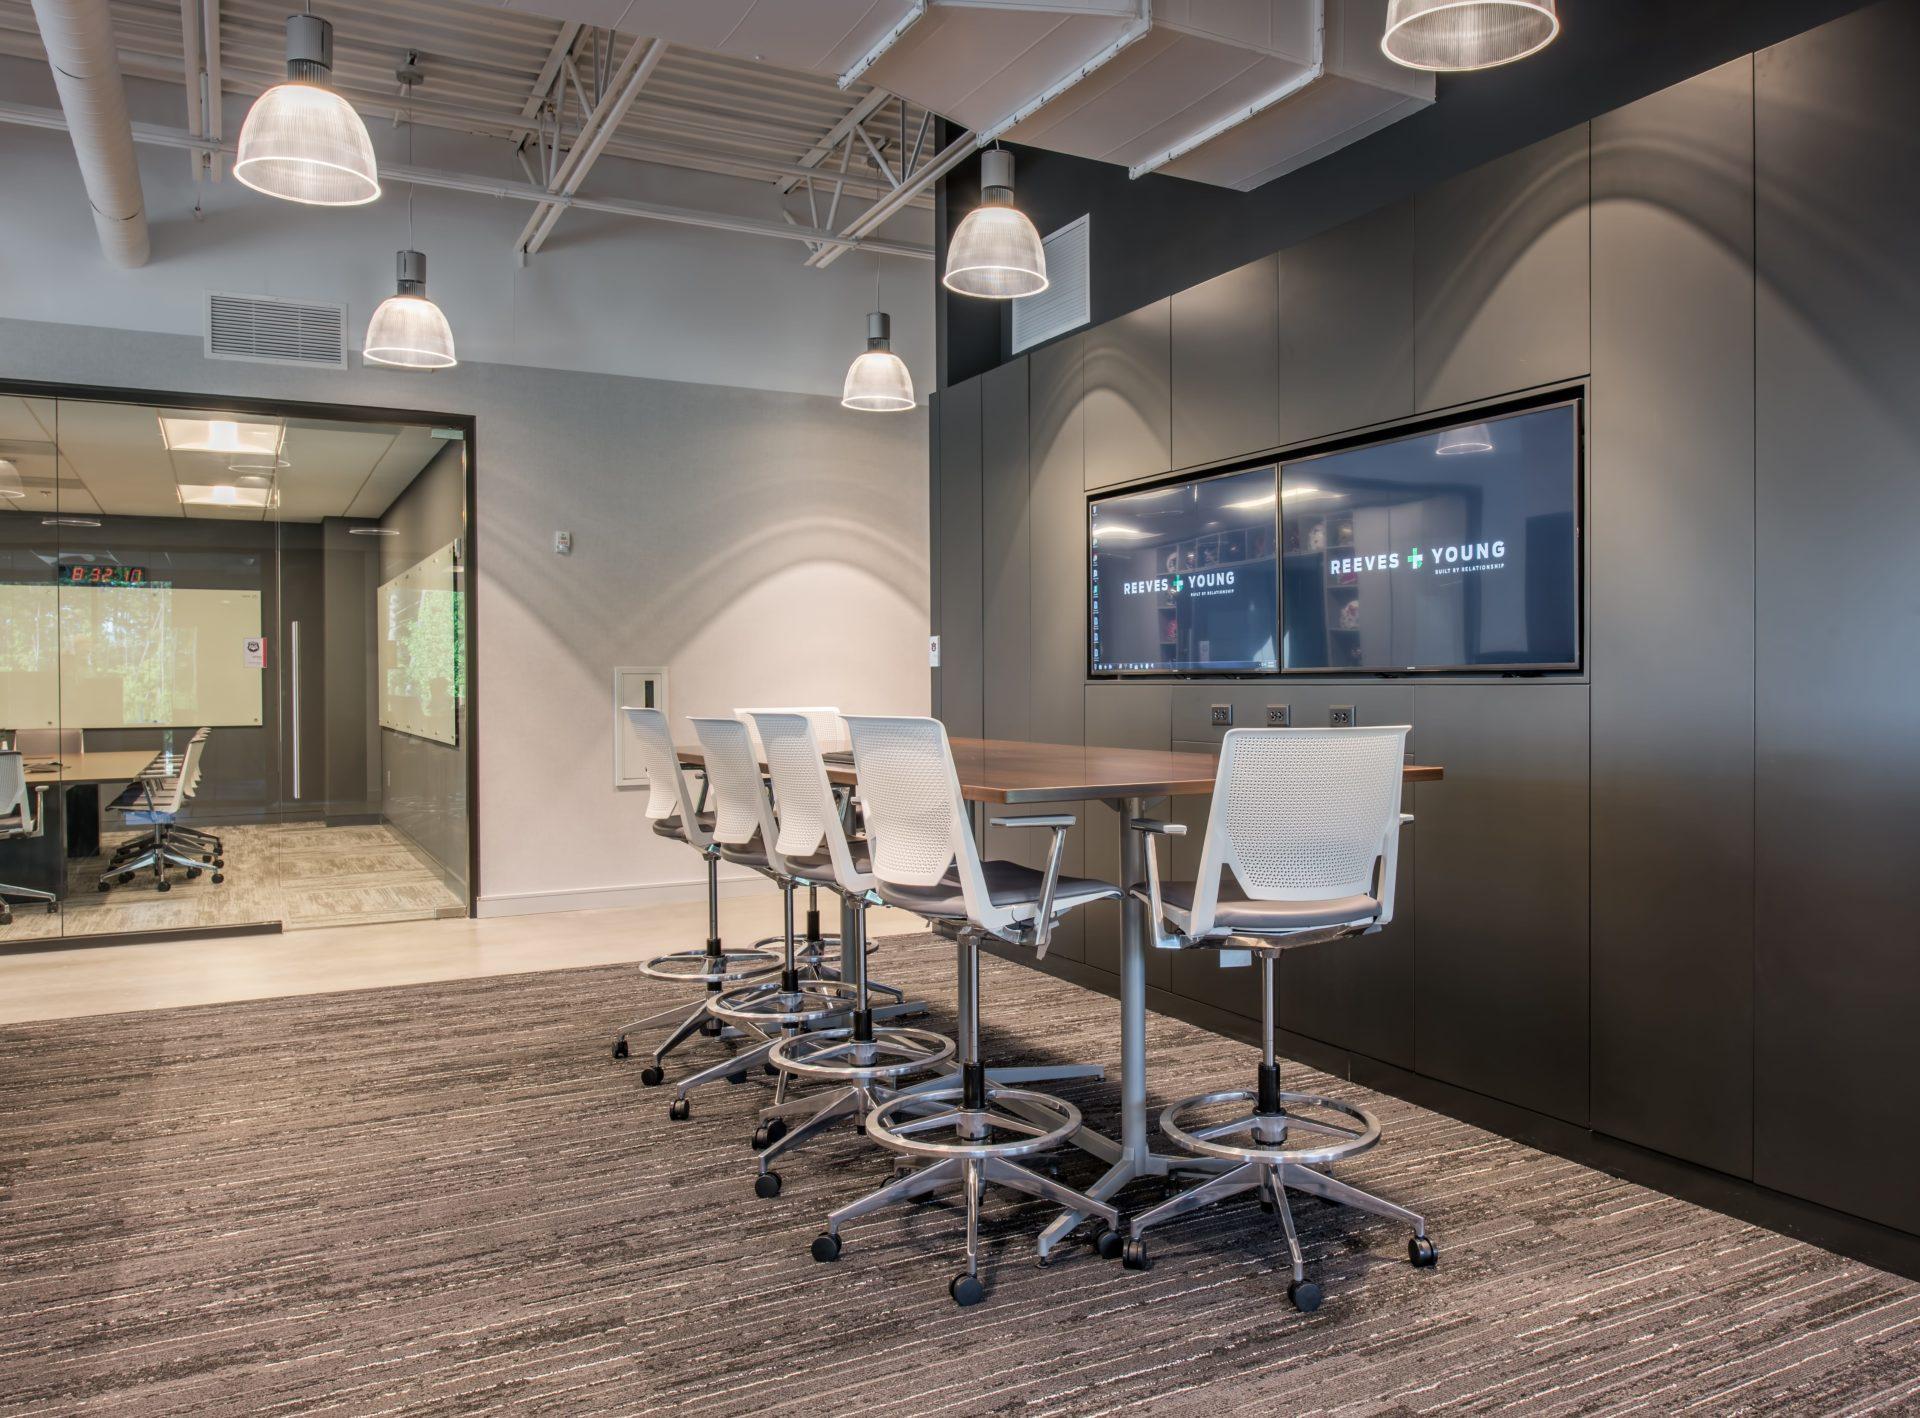 Striped Carpet Tile in Meeting Room